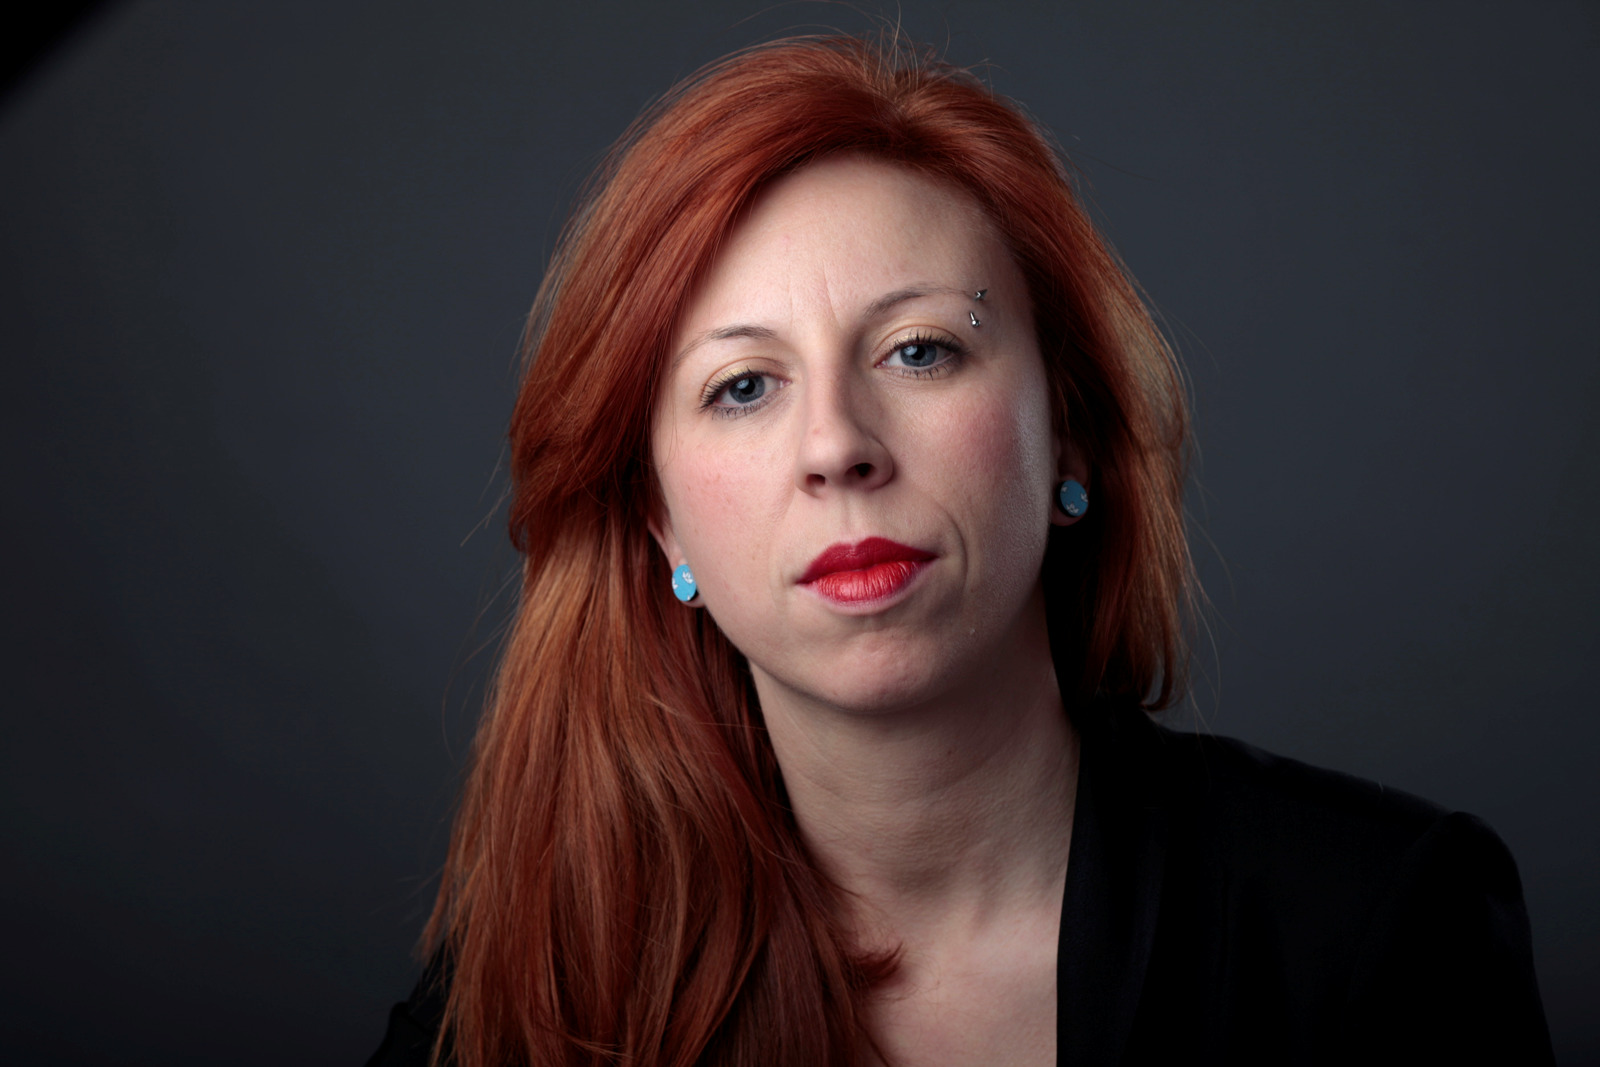 Elisabetta Carosio Regista Fondatrice Compagnia Lumen Progetti, Arti, Teatro